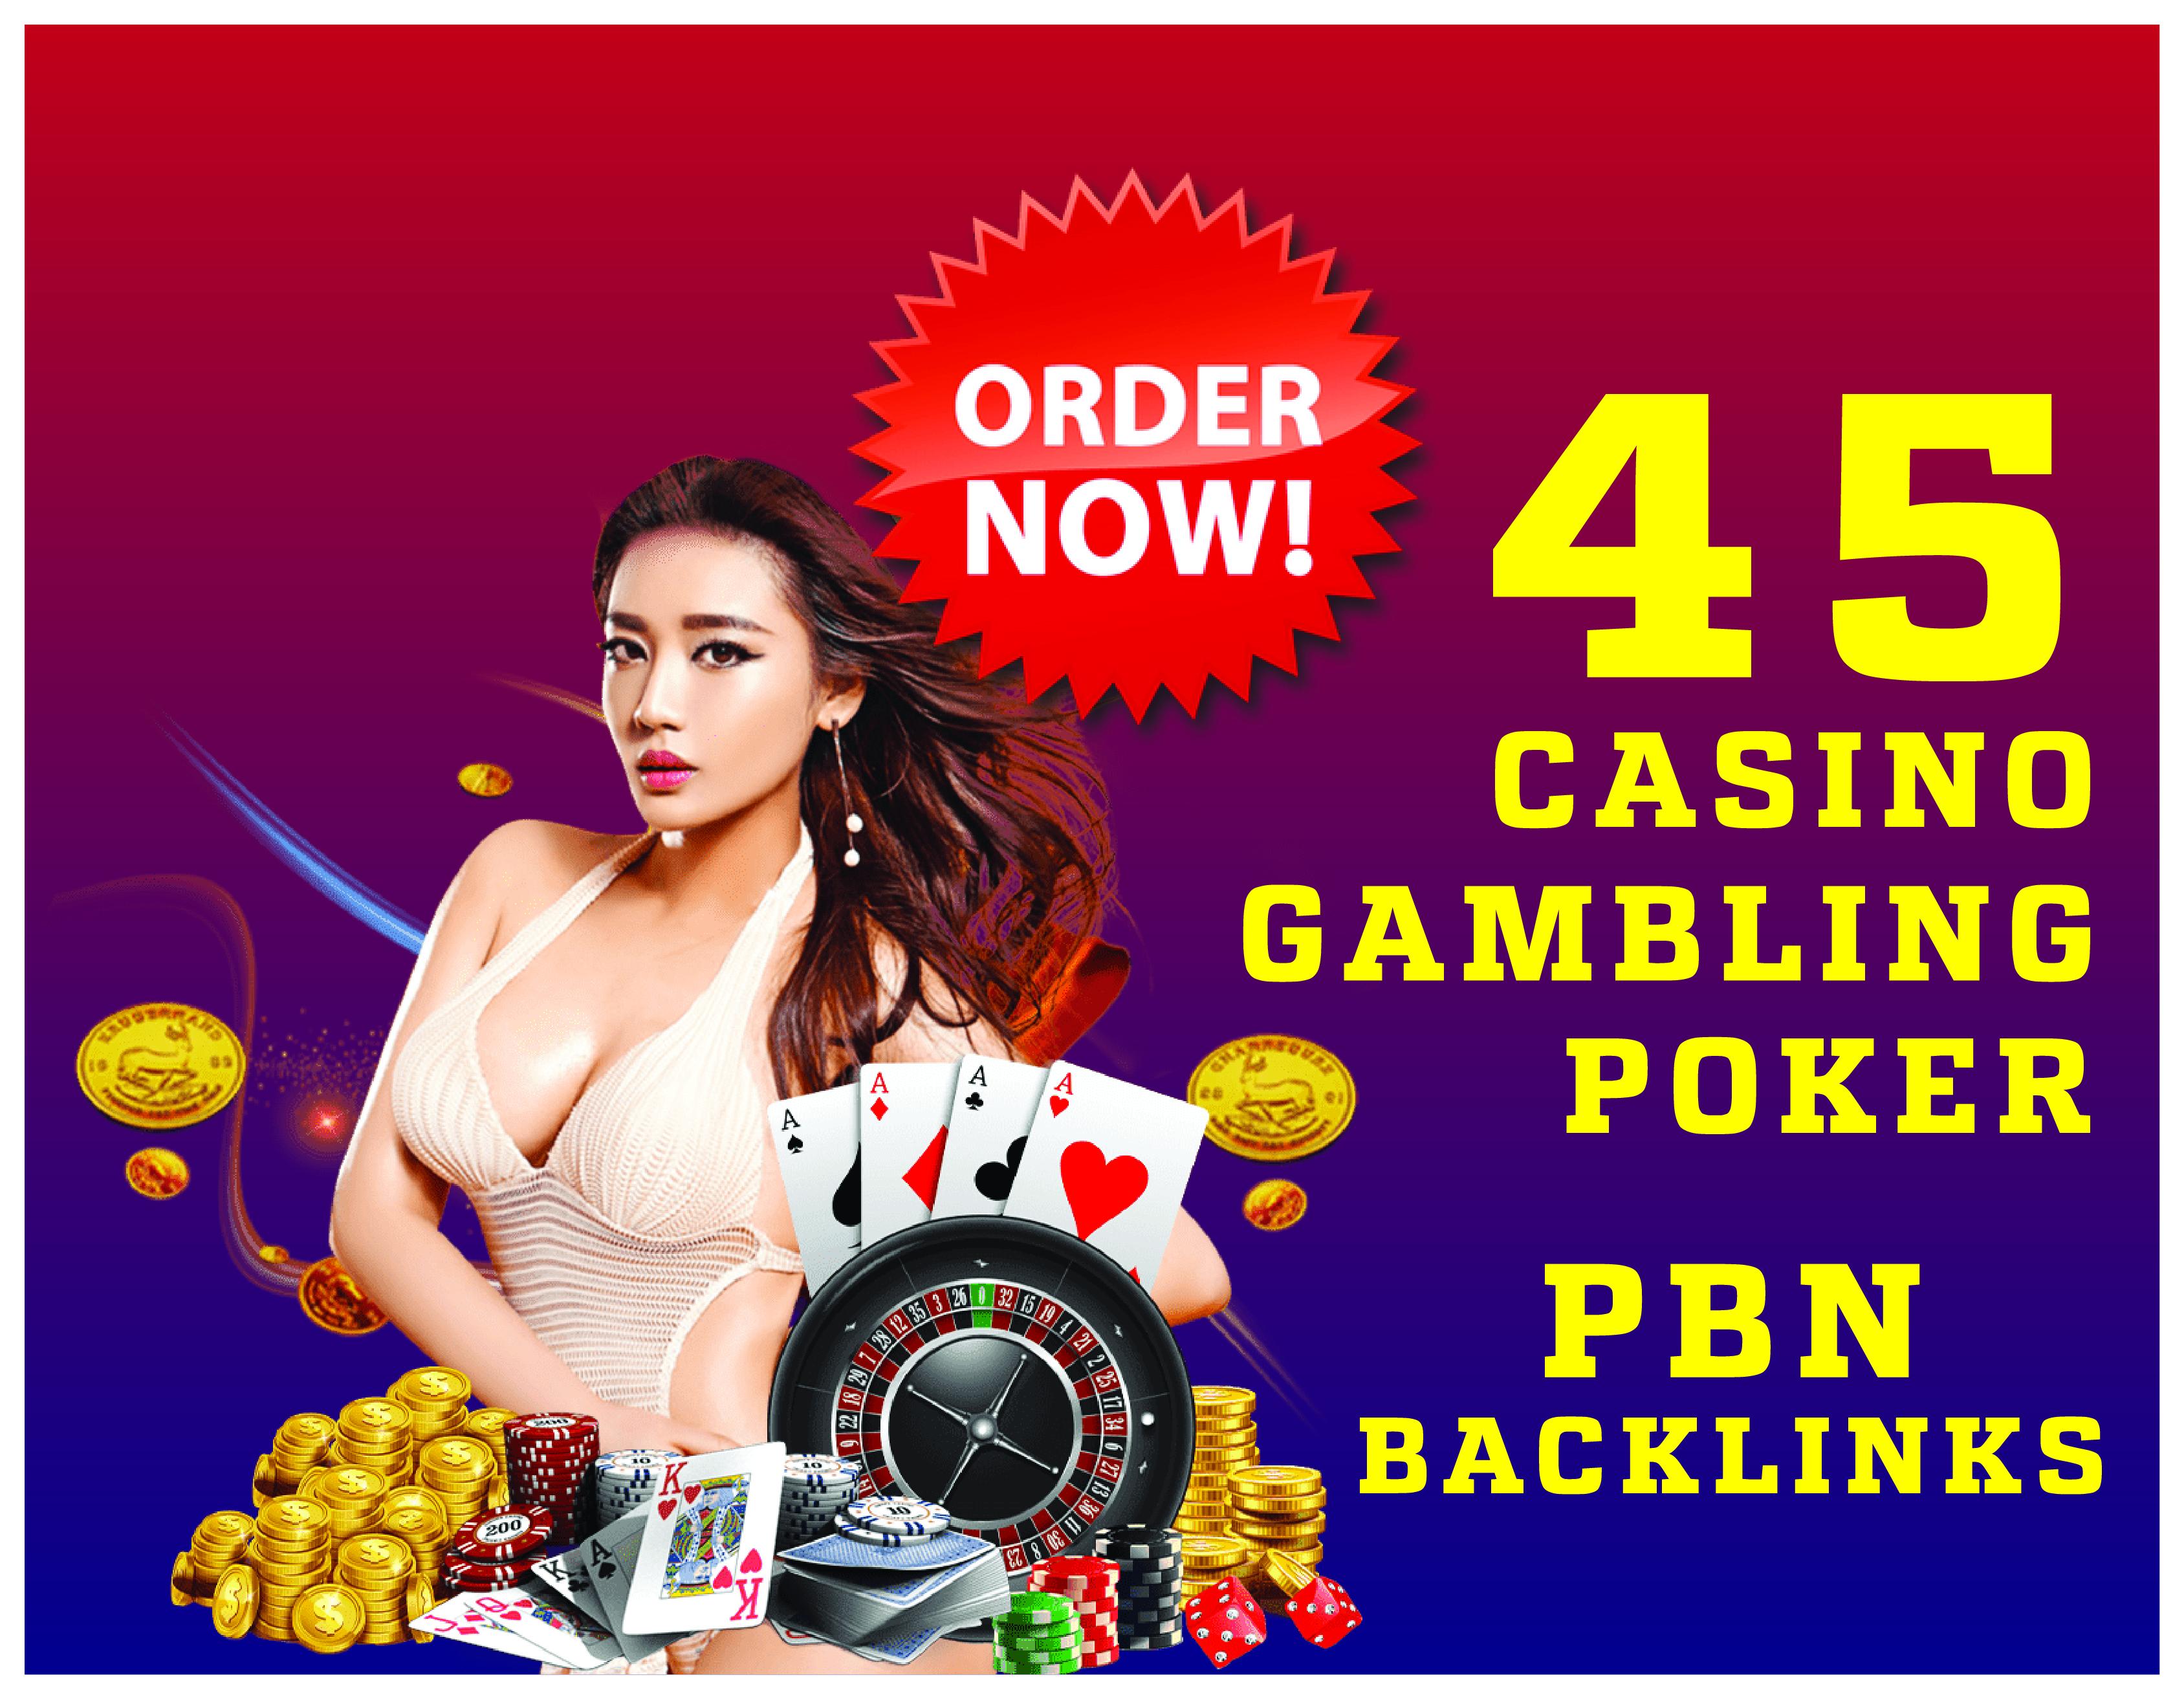 45 HQ PBN Casino Backlinks For Ranking